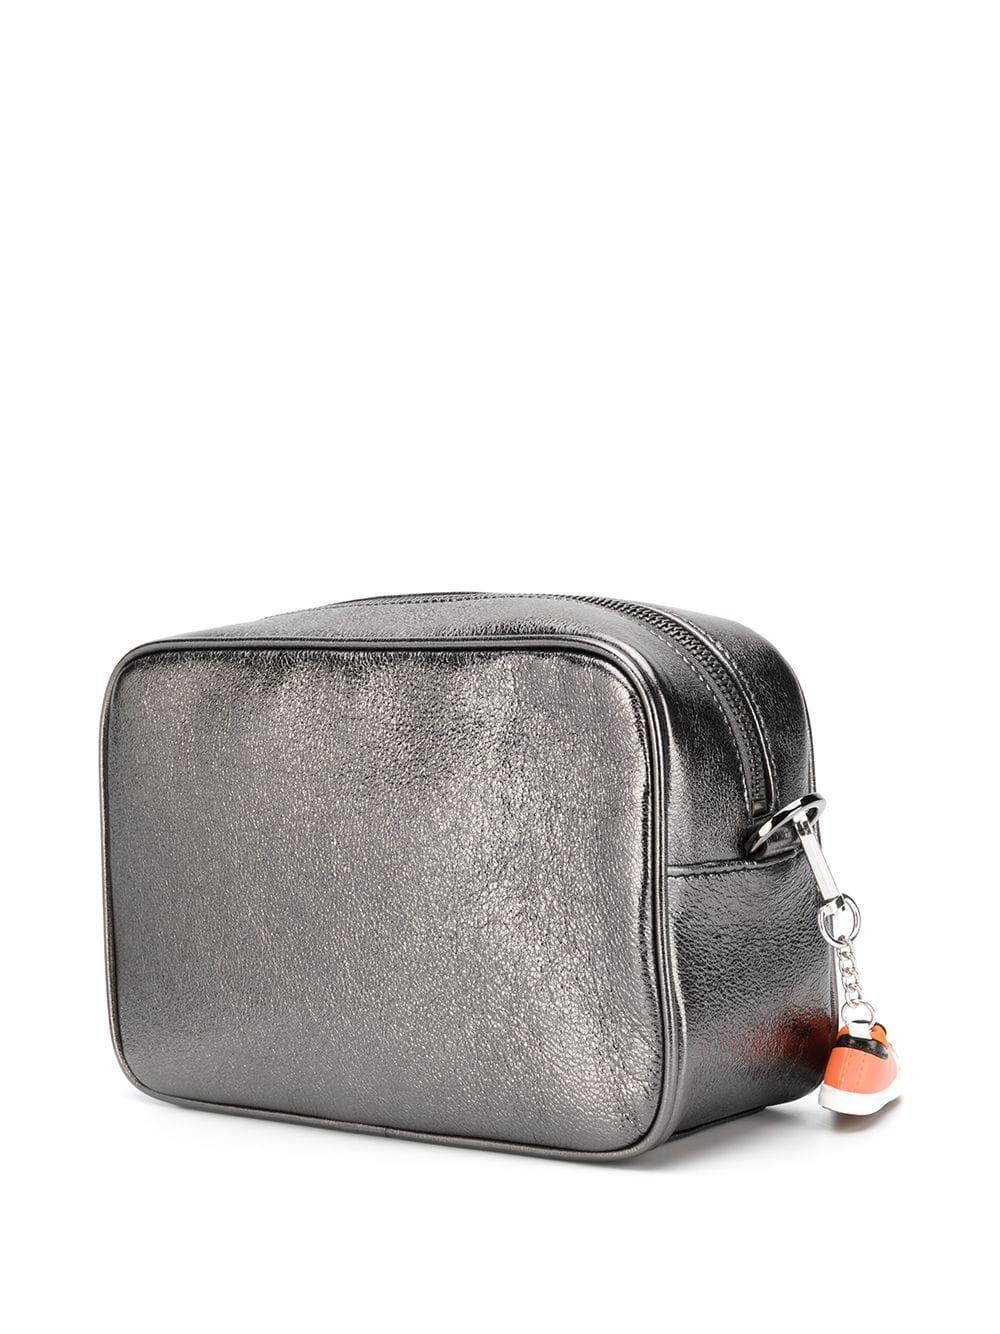 GOLDEN GOOSE WOMEN'S G36WA881D8 GREY LEATHER SHOULDER BAG